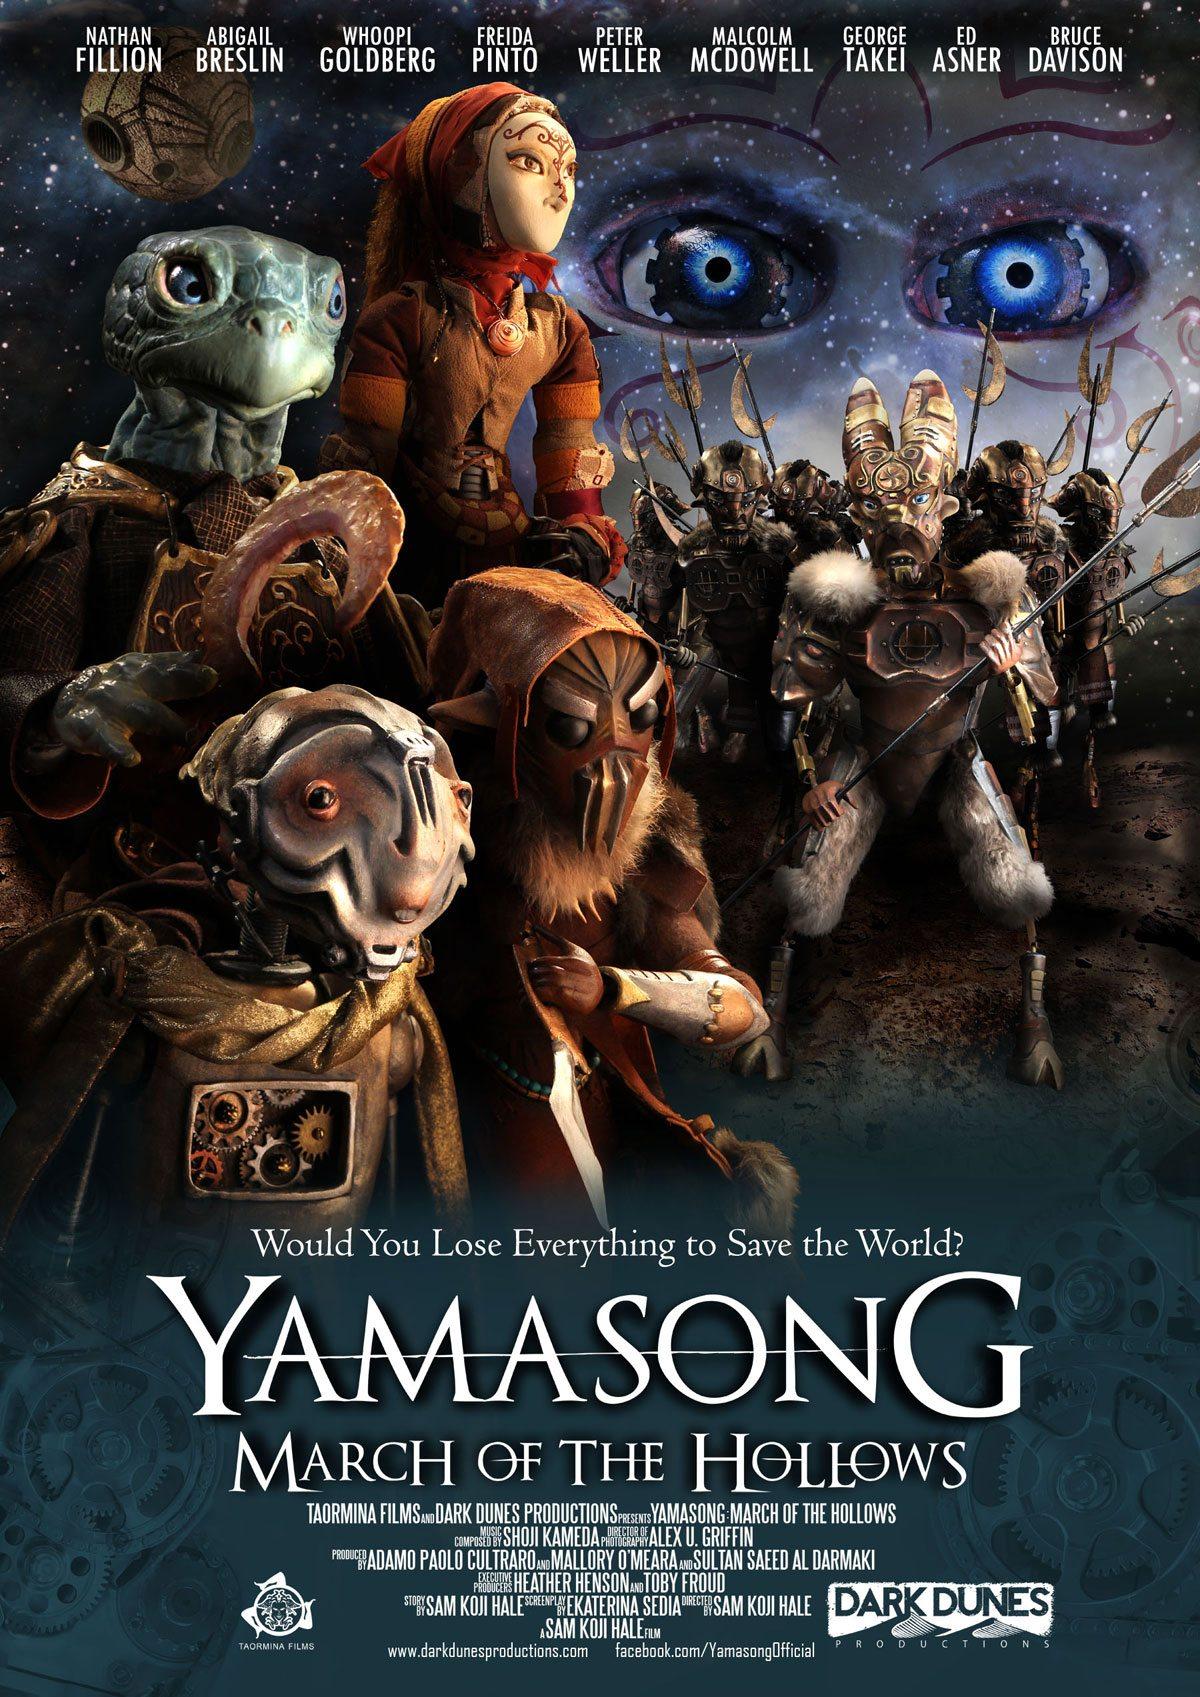 Yamasong poster